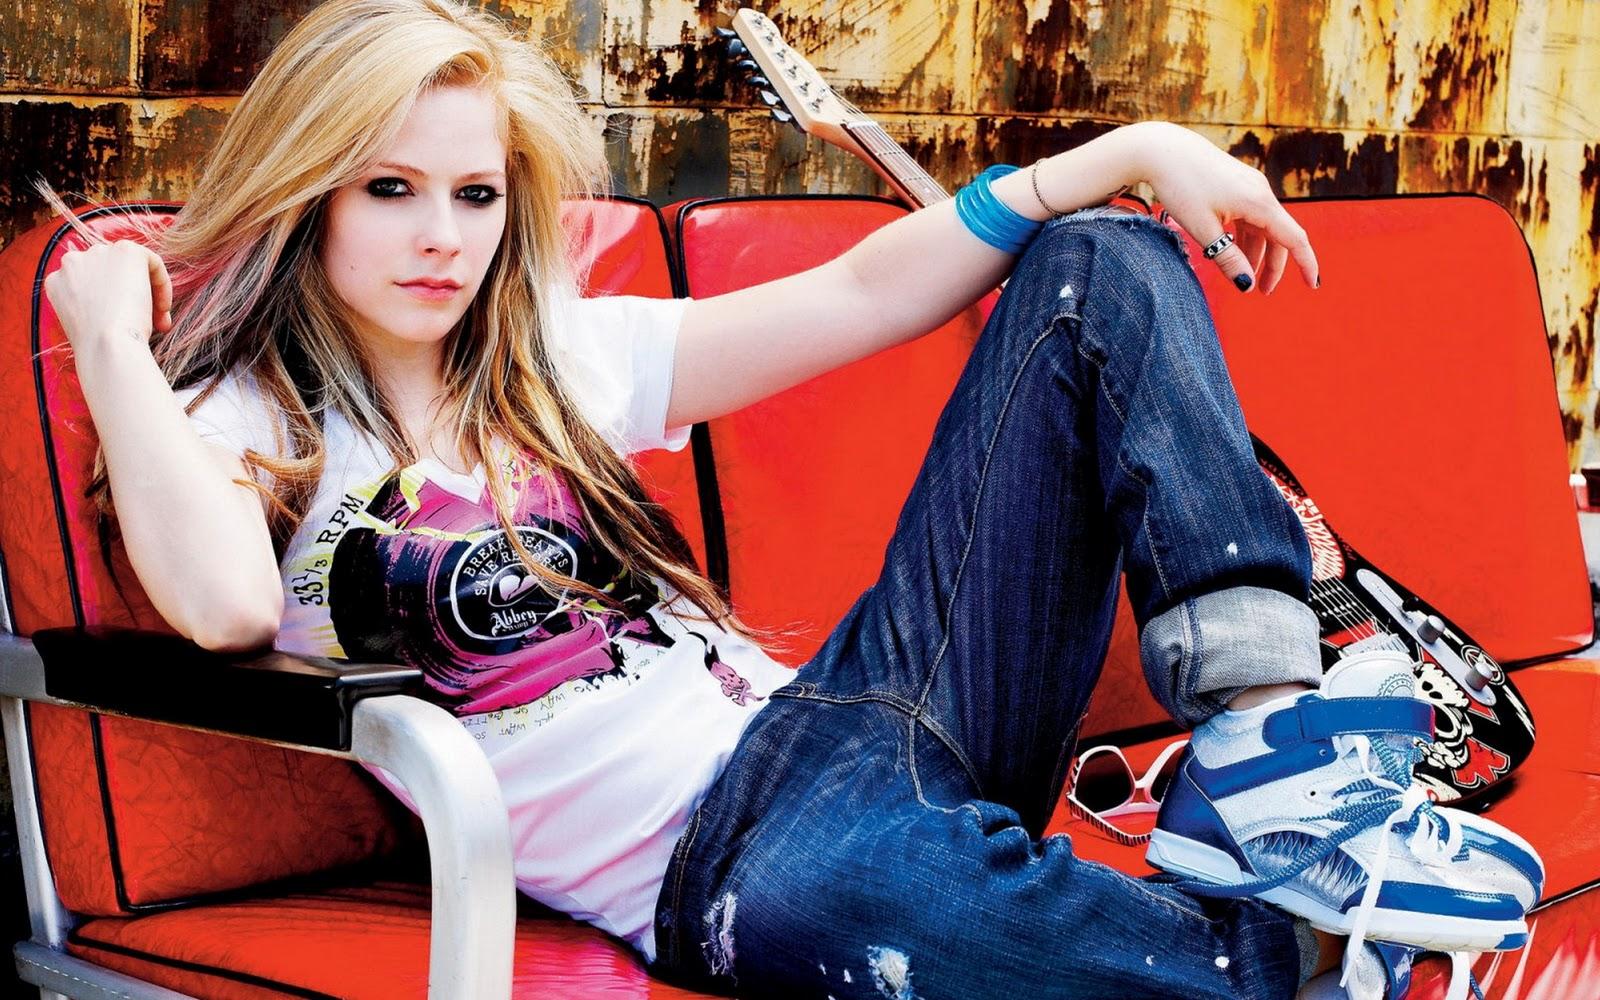 Avril Lavigne 1 Wallpapers: Avril Lavigne Hot Wallpapers